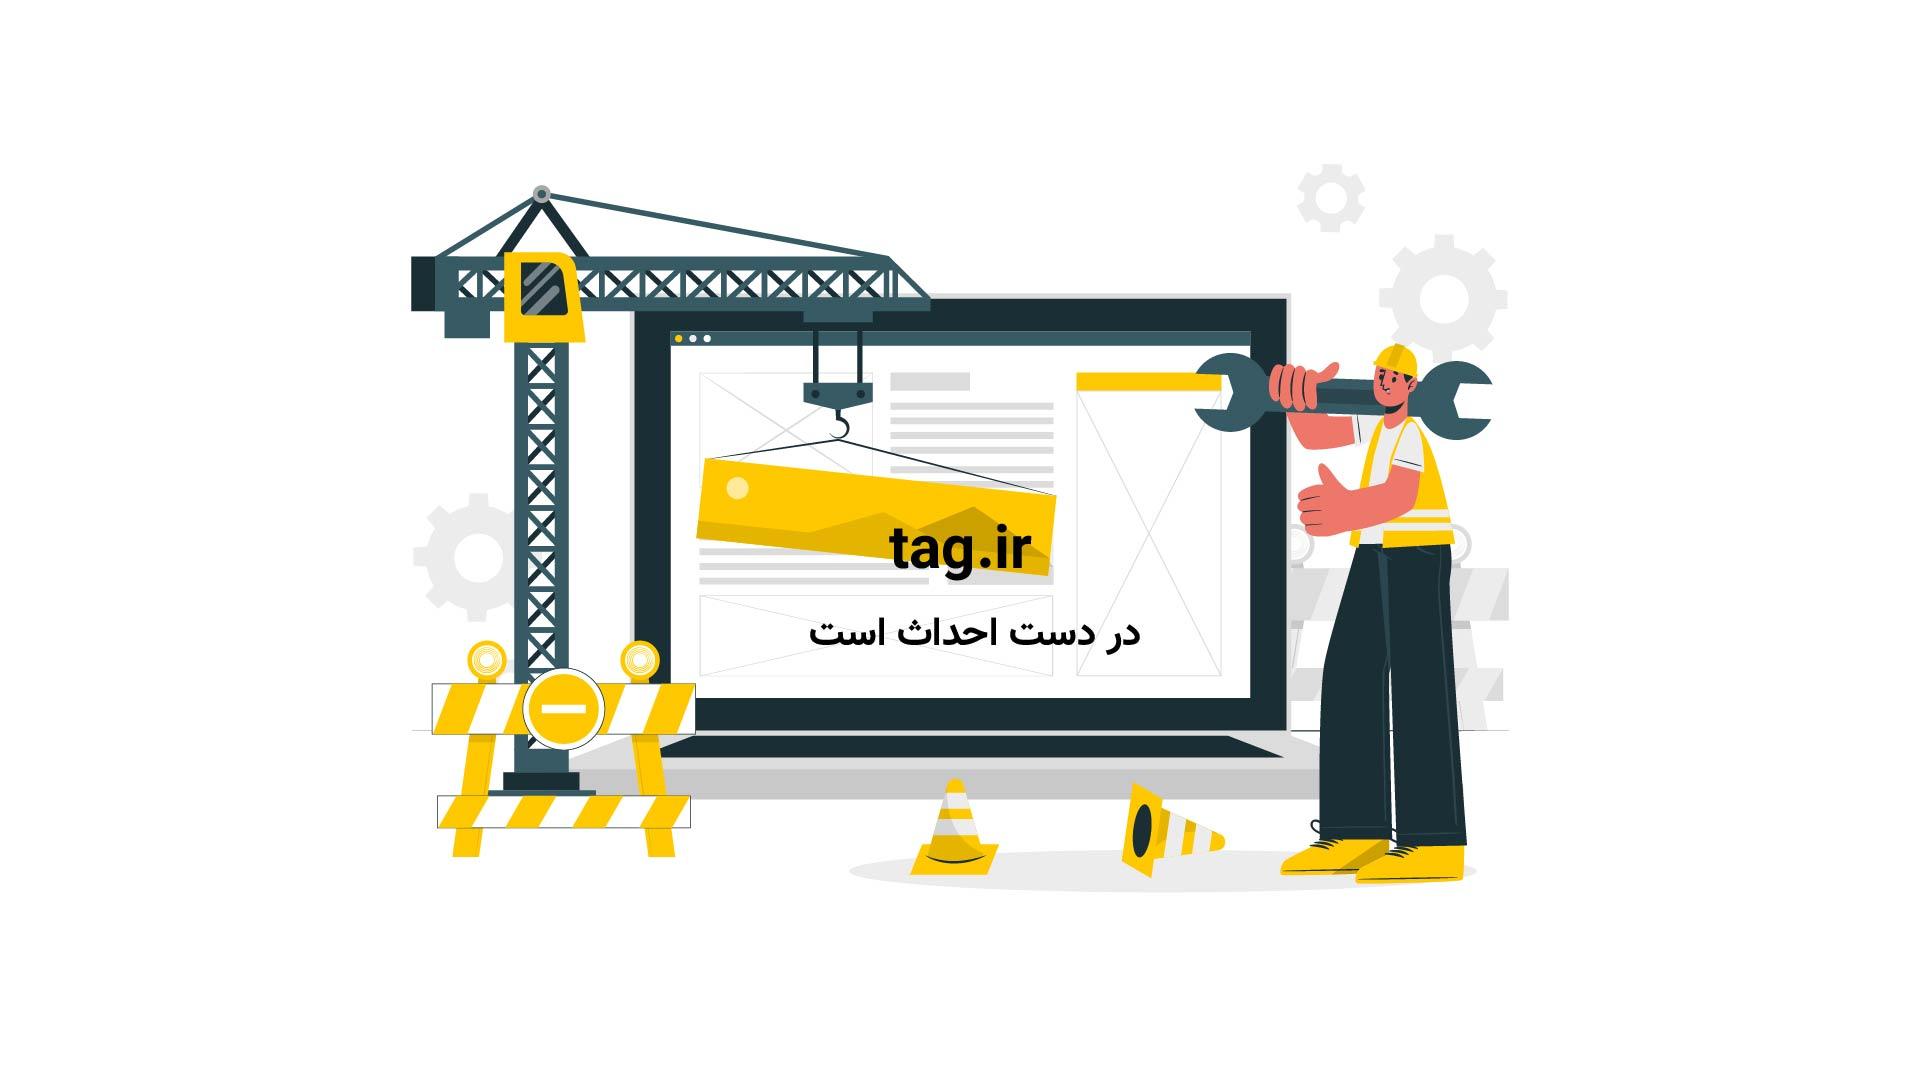 مدرسه-ارومیه-اسلام-آباد | تگ